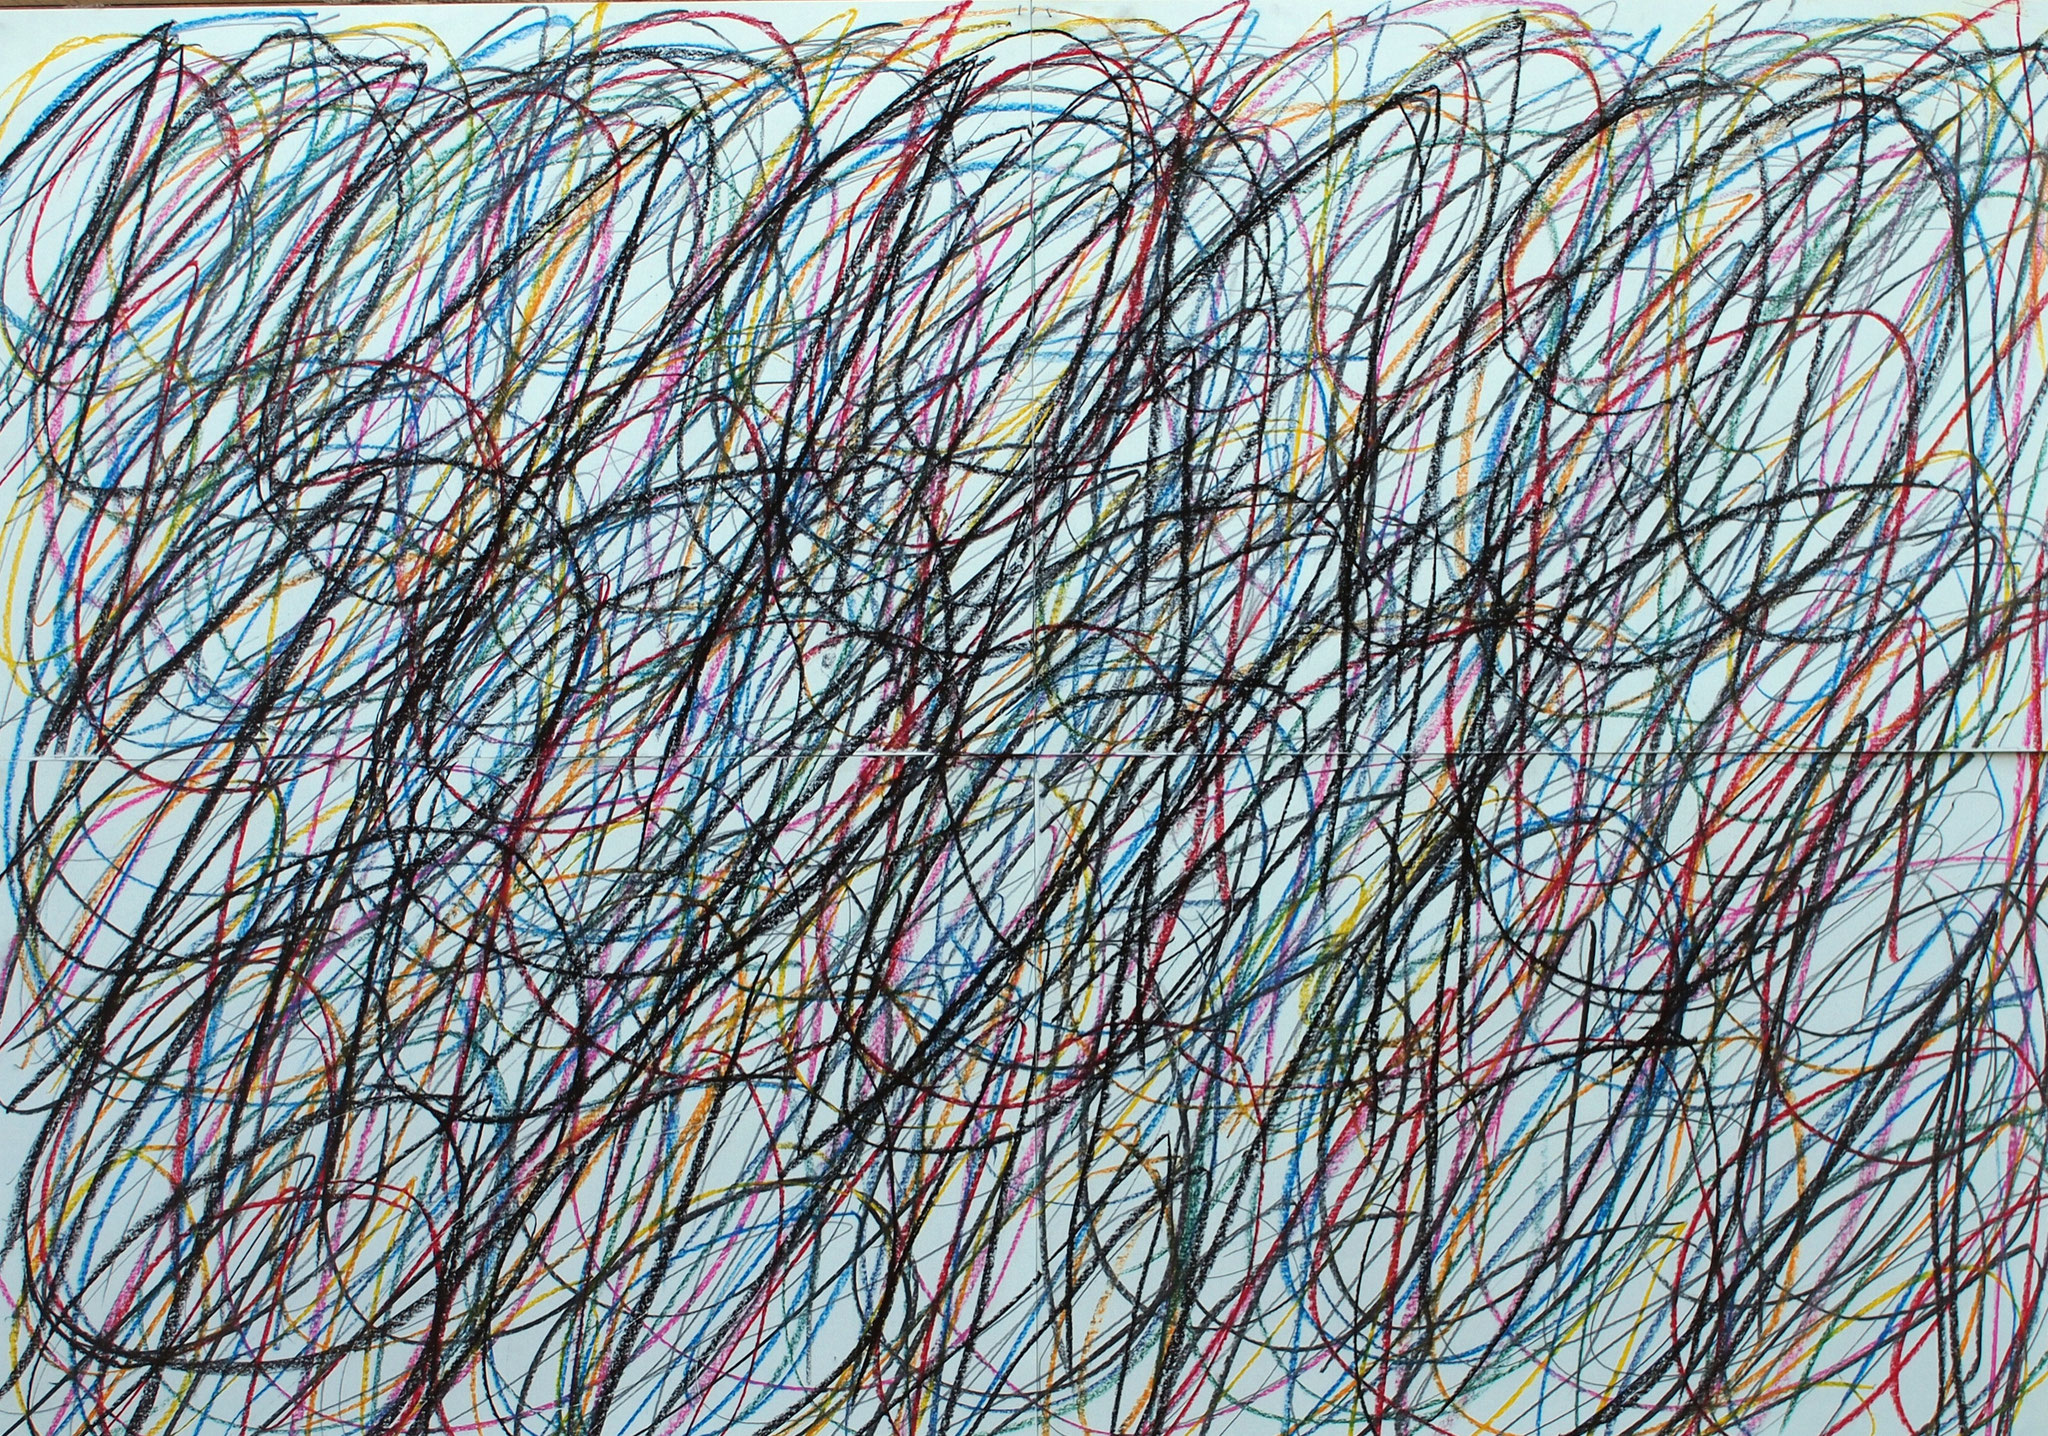 binär x 4 - 2016  - Pastellkreide, Kohle auf Papier - 100 x 140 cm (4-teilig)